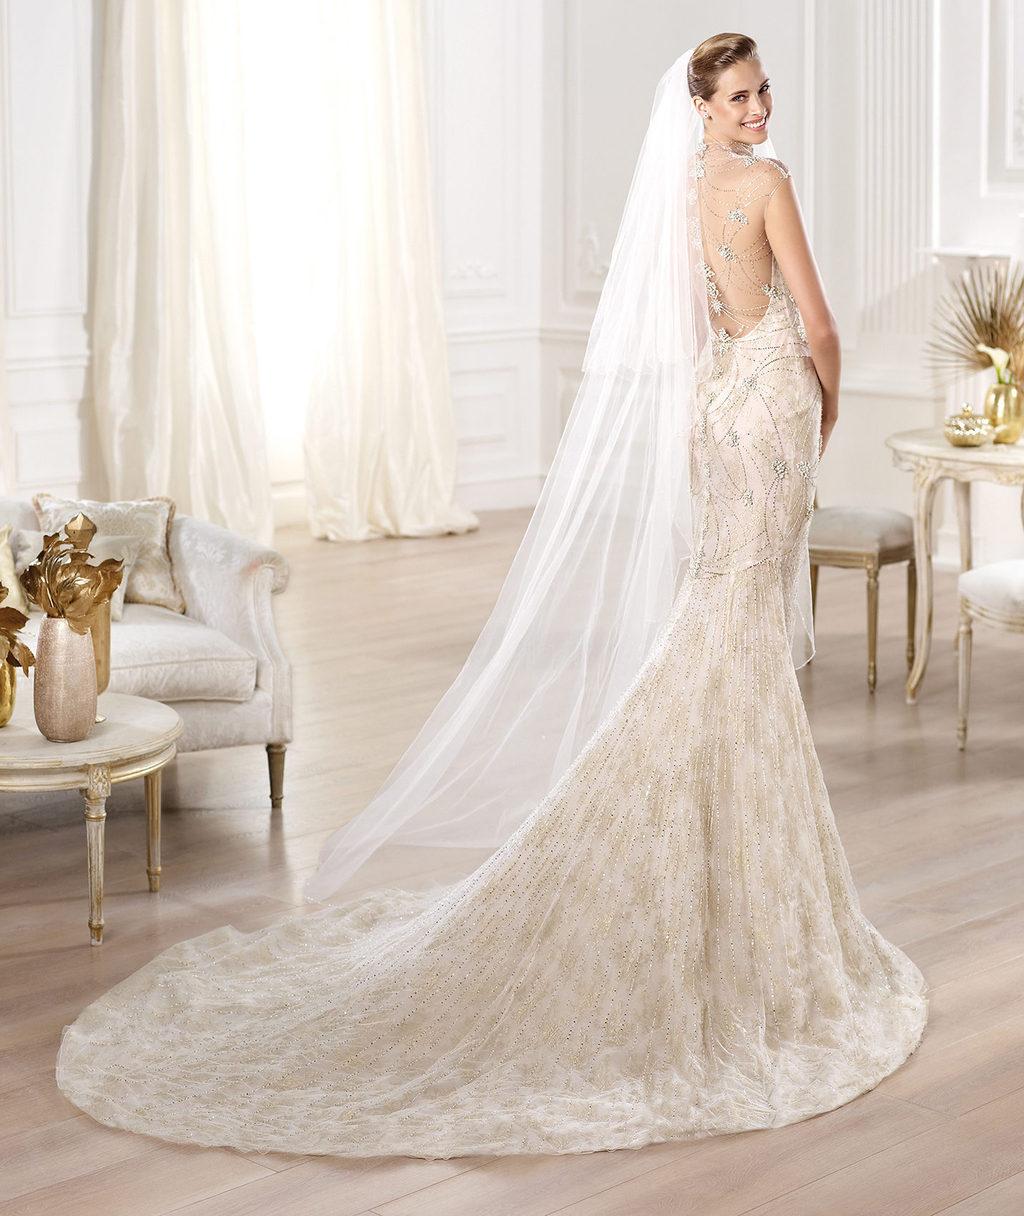 Yalim-wedding-dress-from-pronovias-atelier-2014-bridal.full